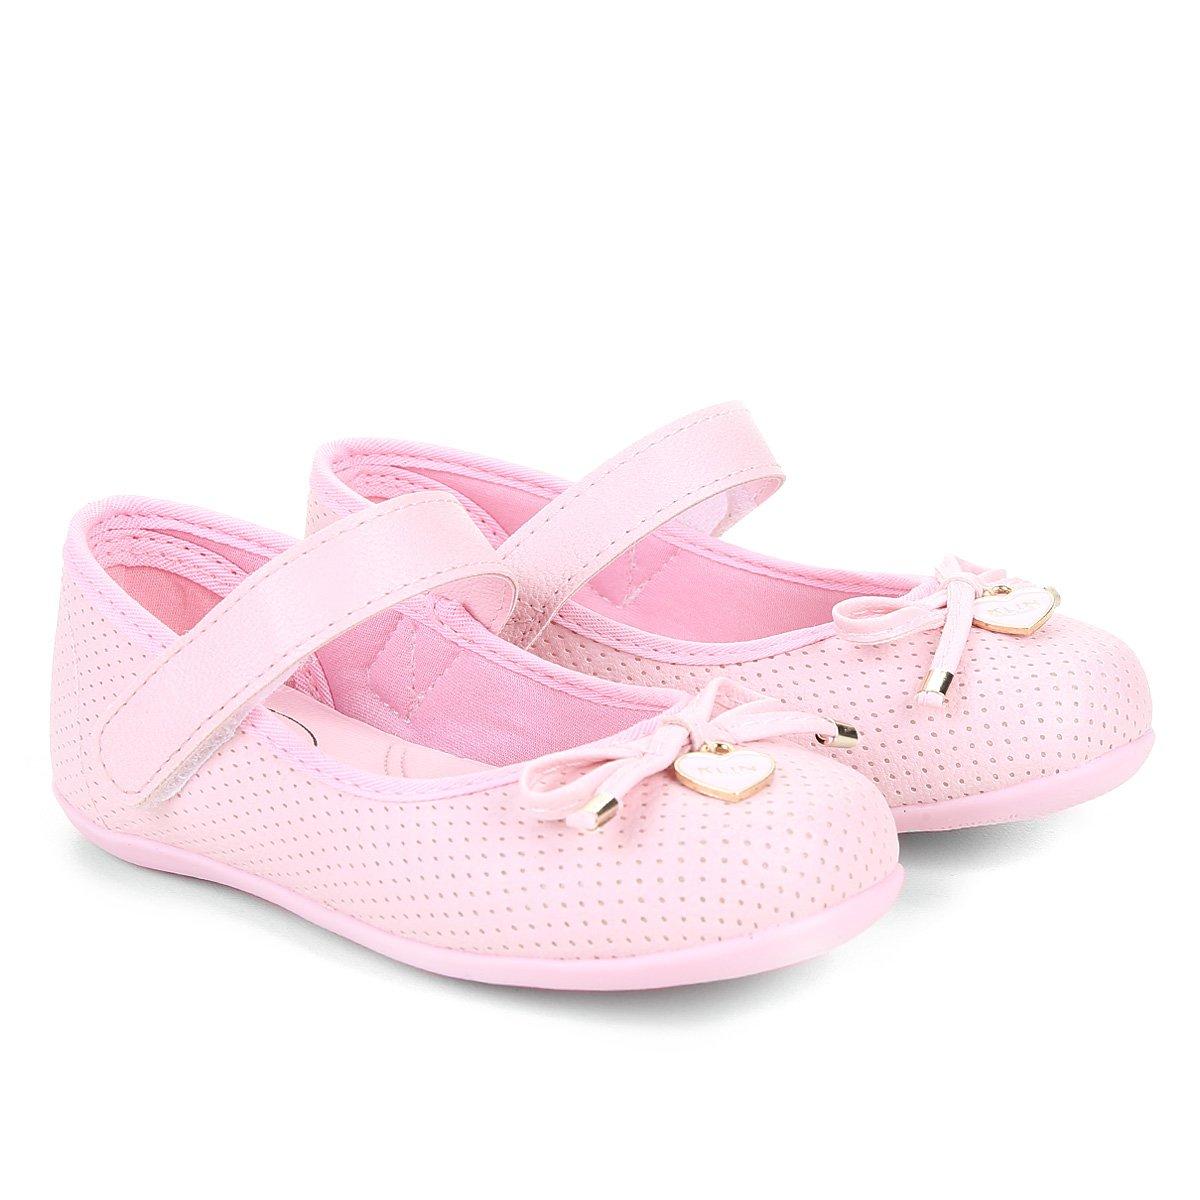 b6e5a3b135 Sapatilha Infantil Klin Perfuros Velcro Laço Feminina